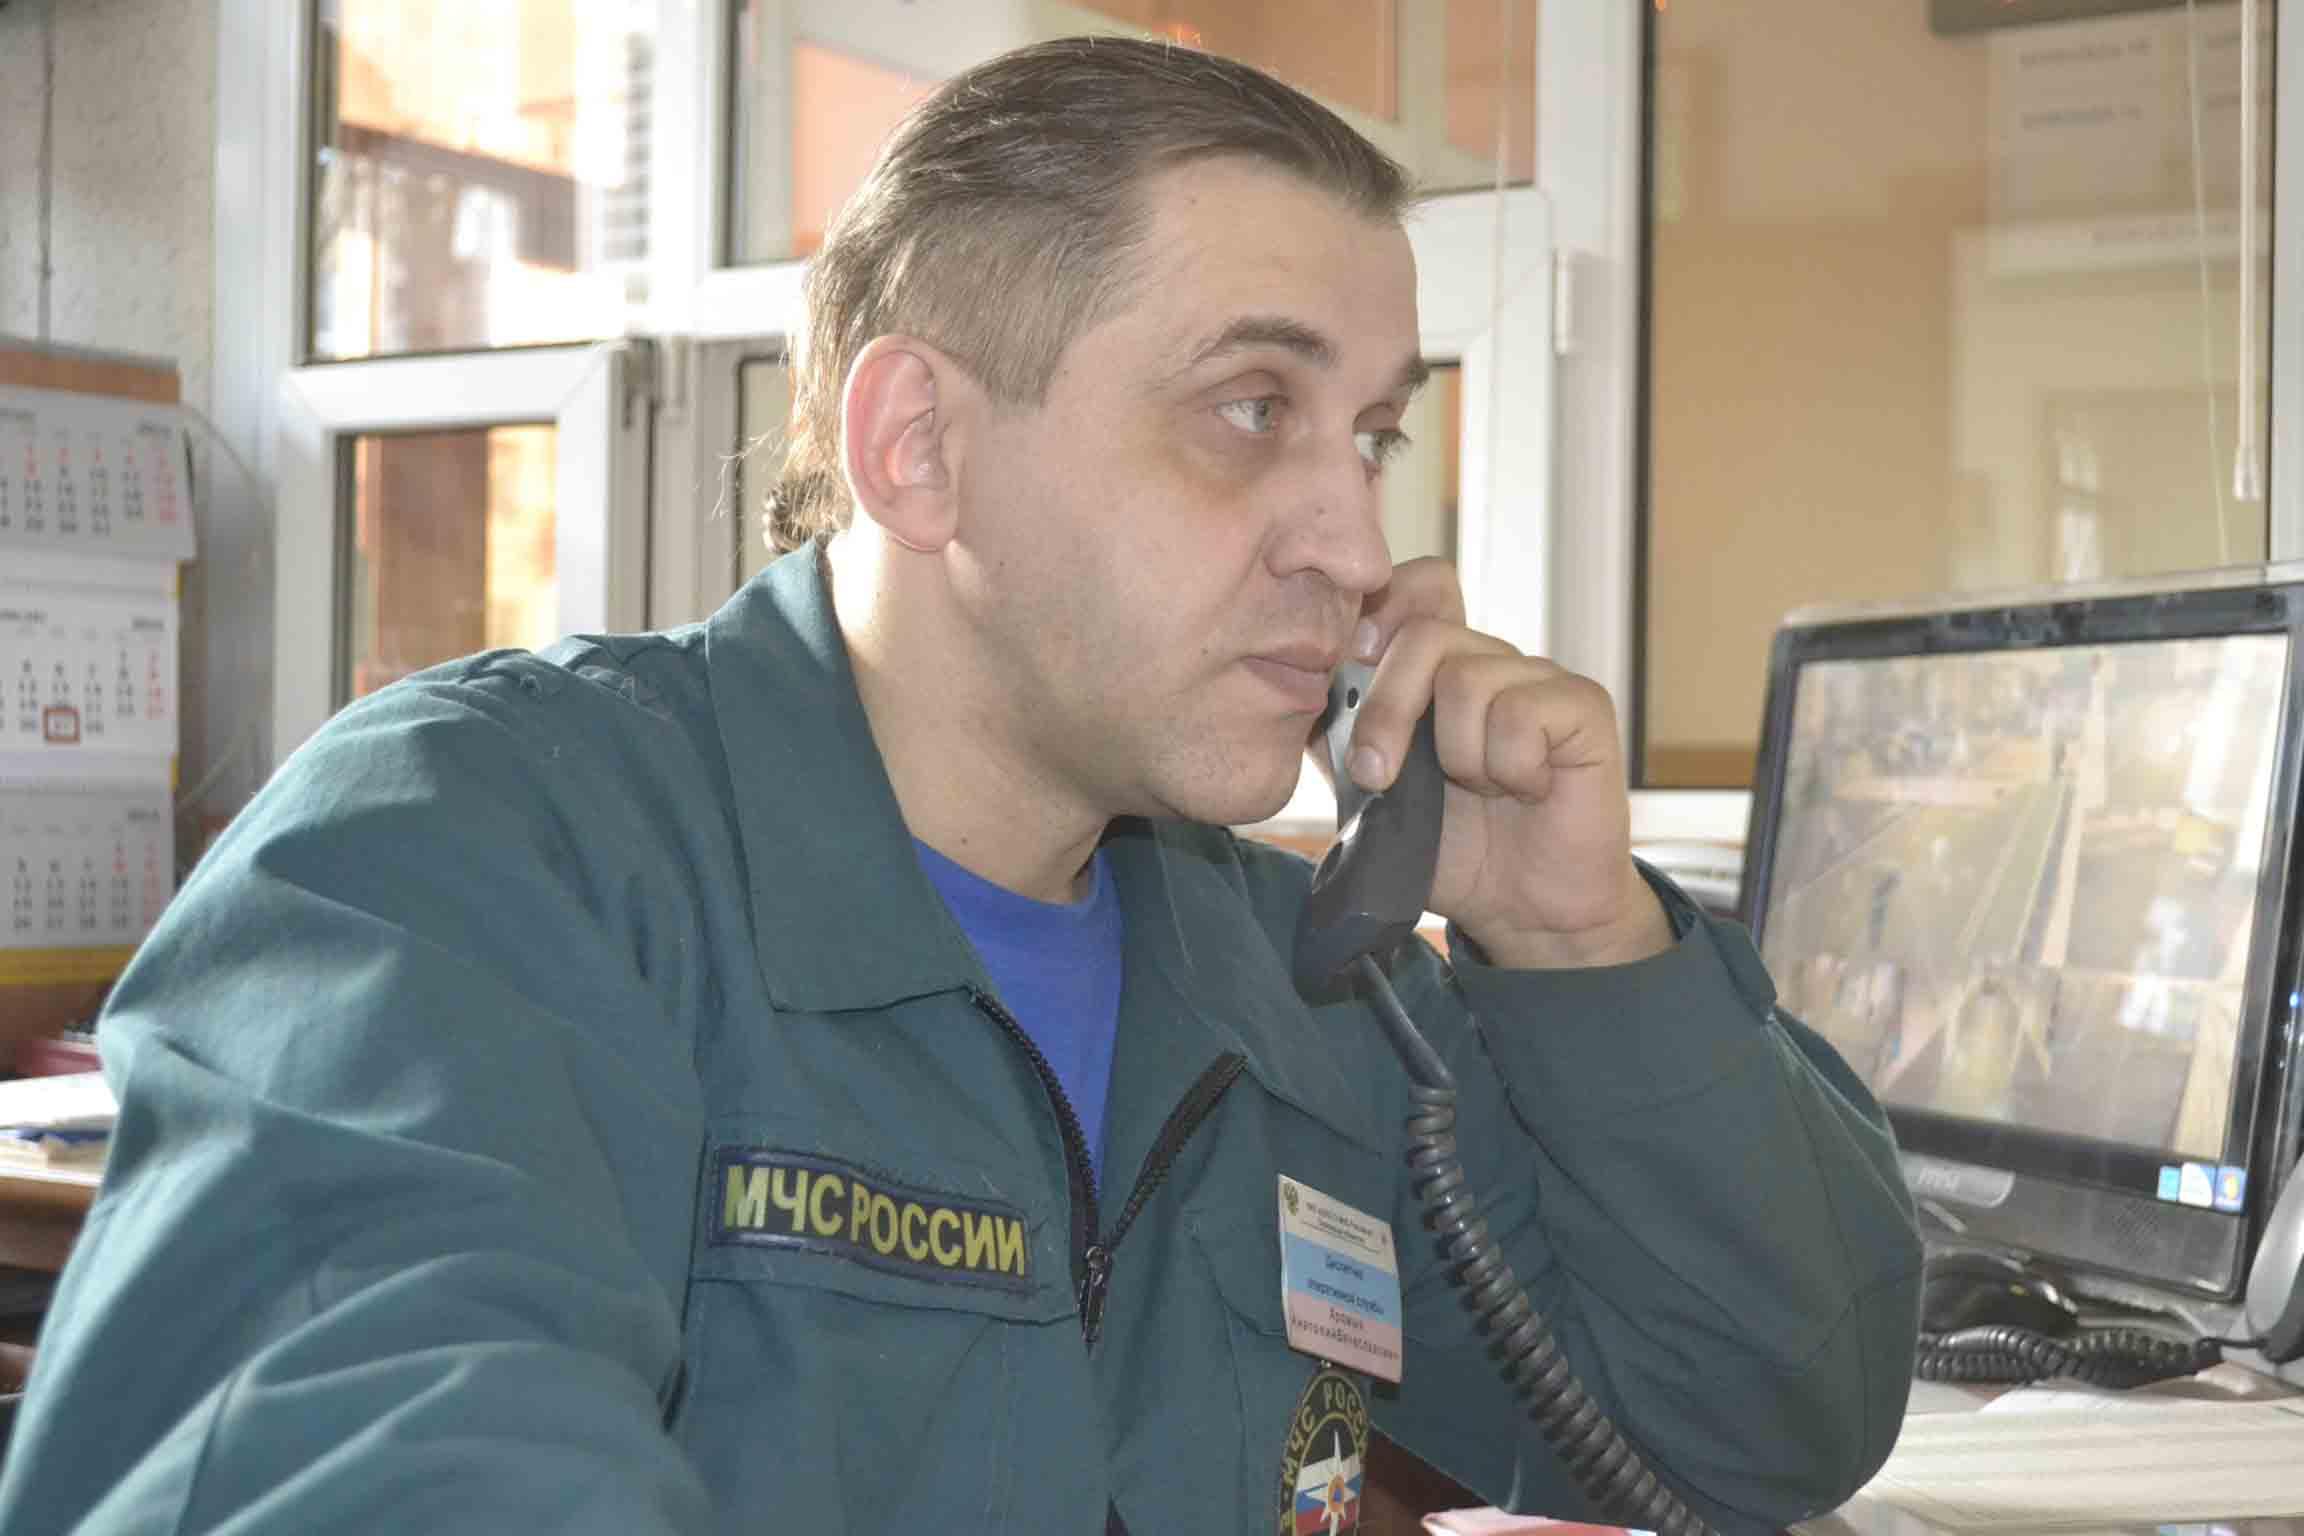 Диспетчер орловского МЧС – в числе факелоносцев  паралимпийского огня